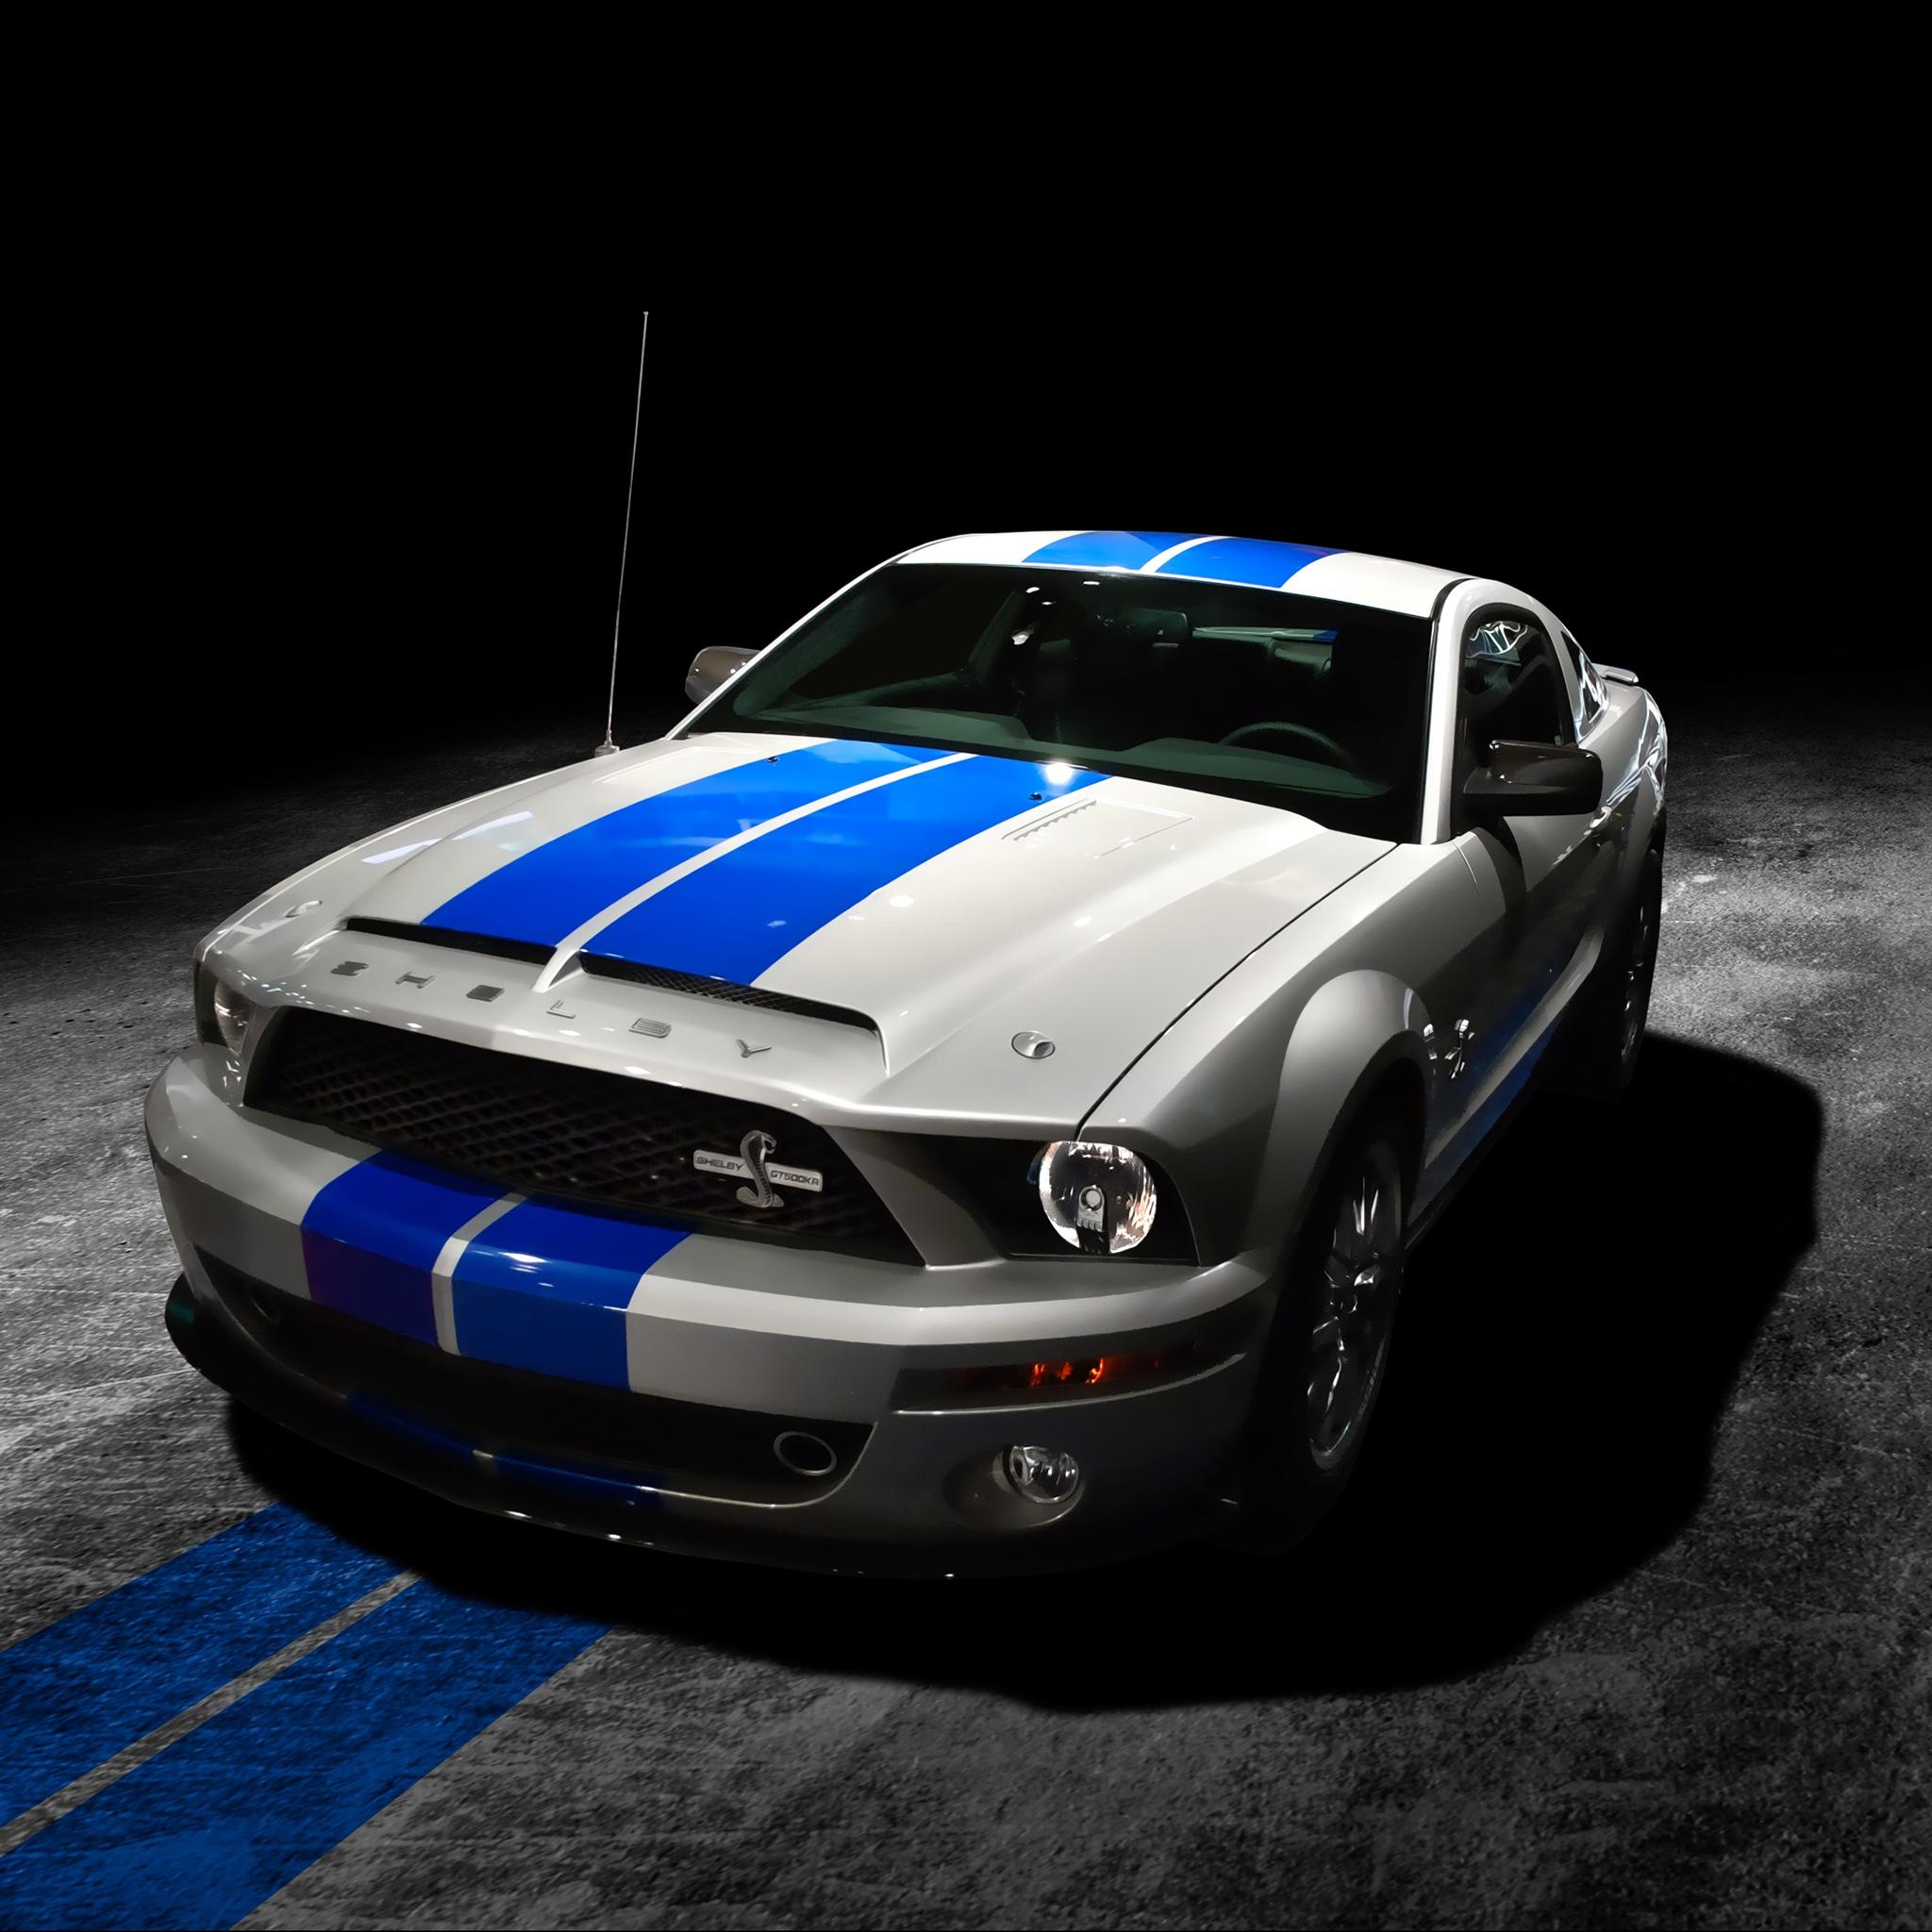 Mustang Shelby GT500KR Mustang Shelby GT500KR   iPad